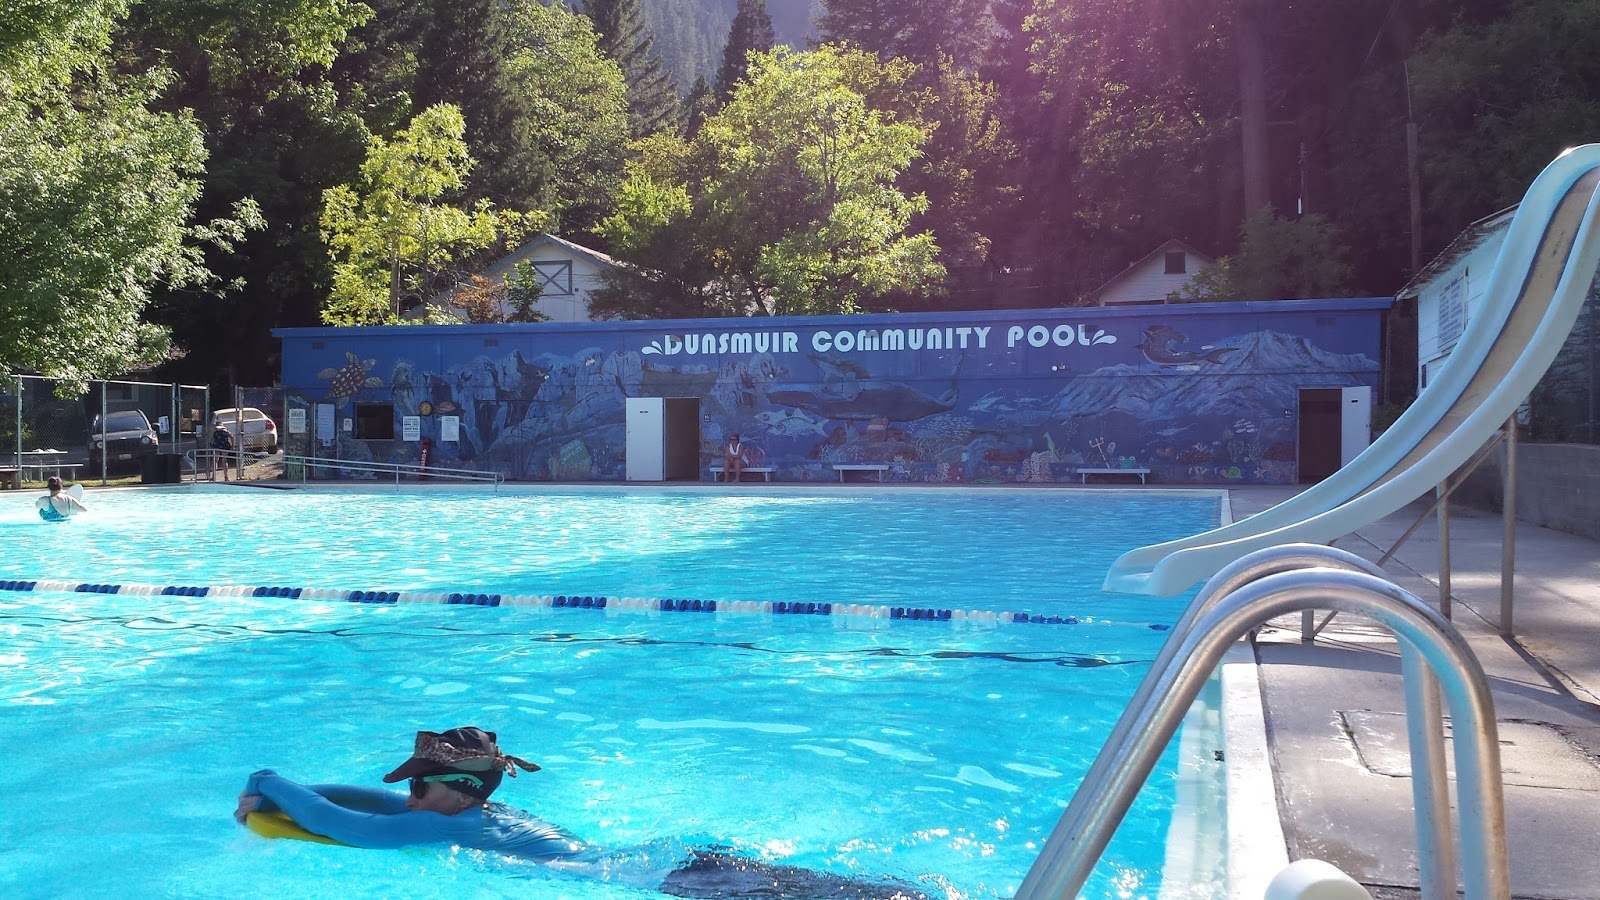 Dunsmuir Community Pool!